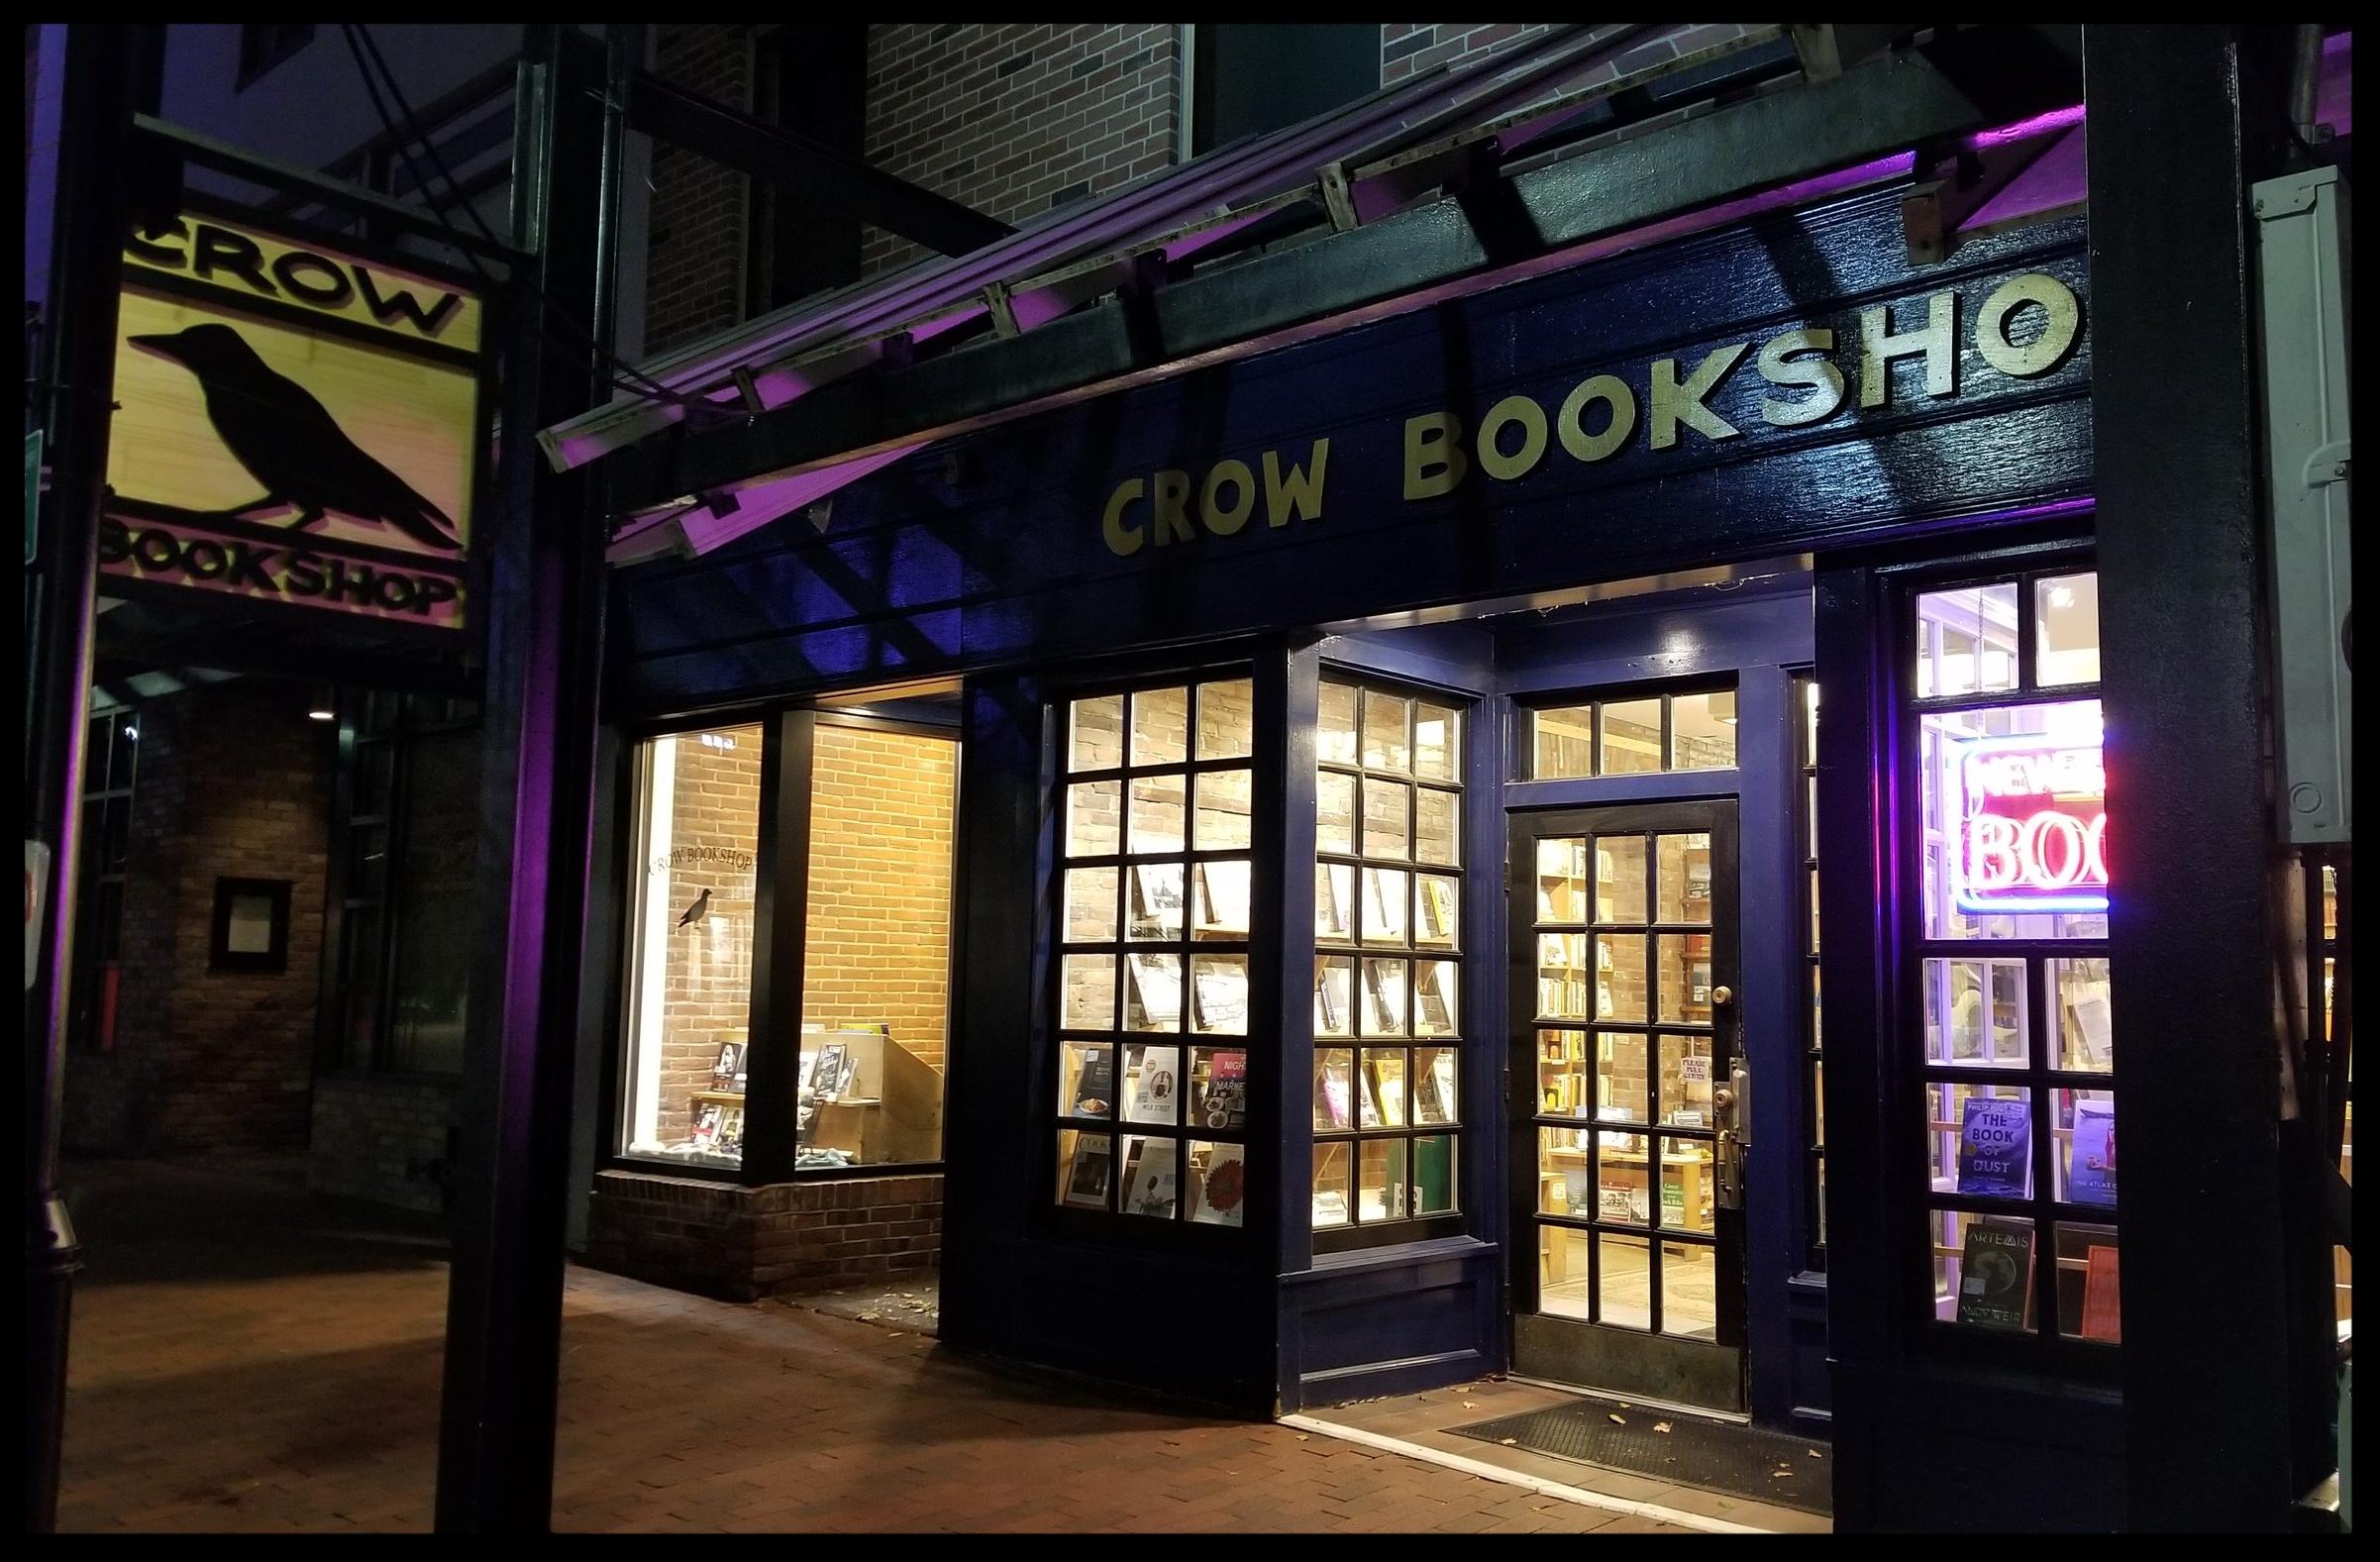 Crow Bookshop  in Burlington, VT